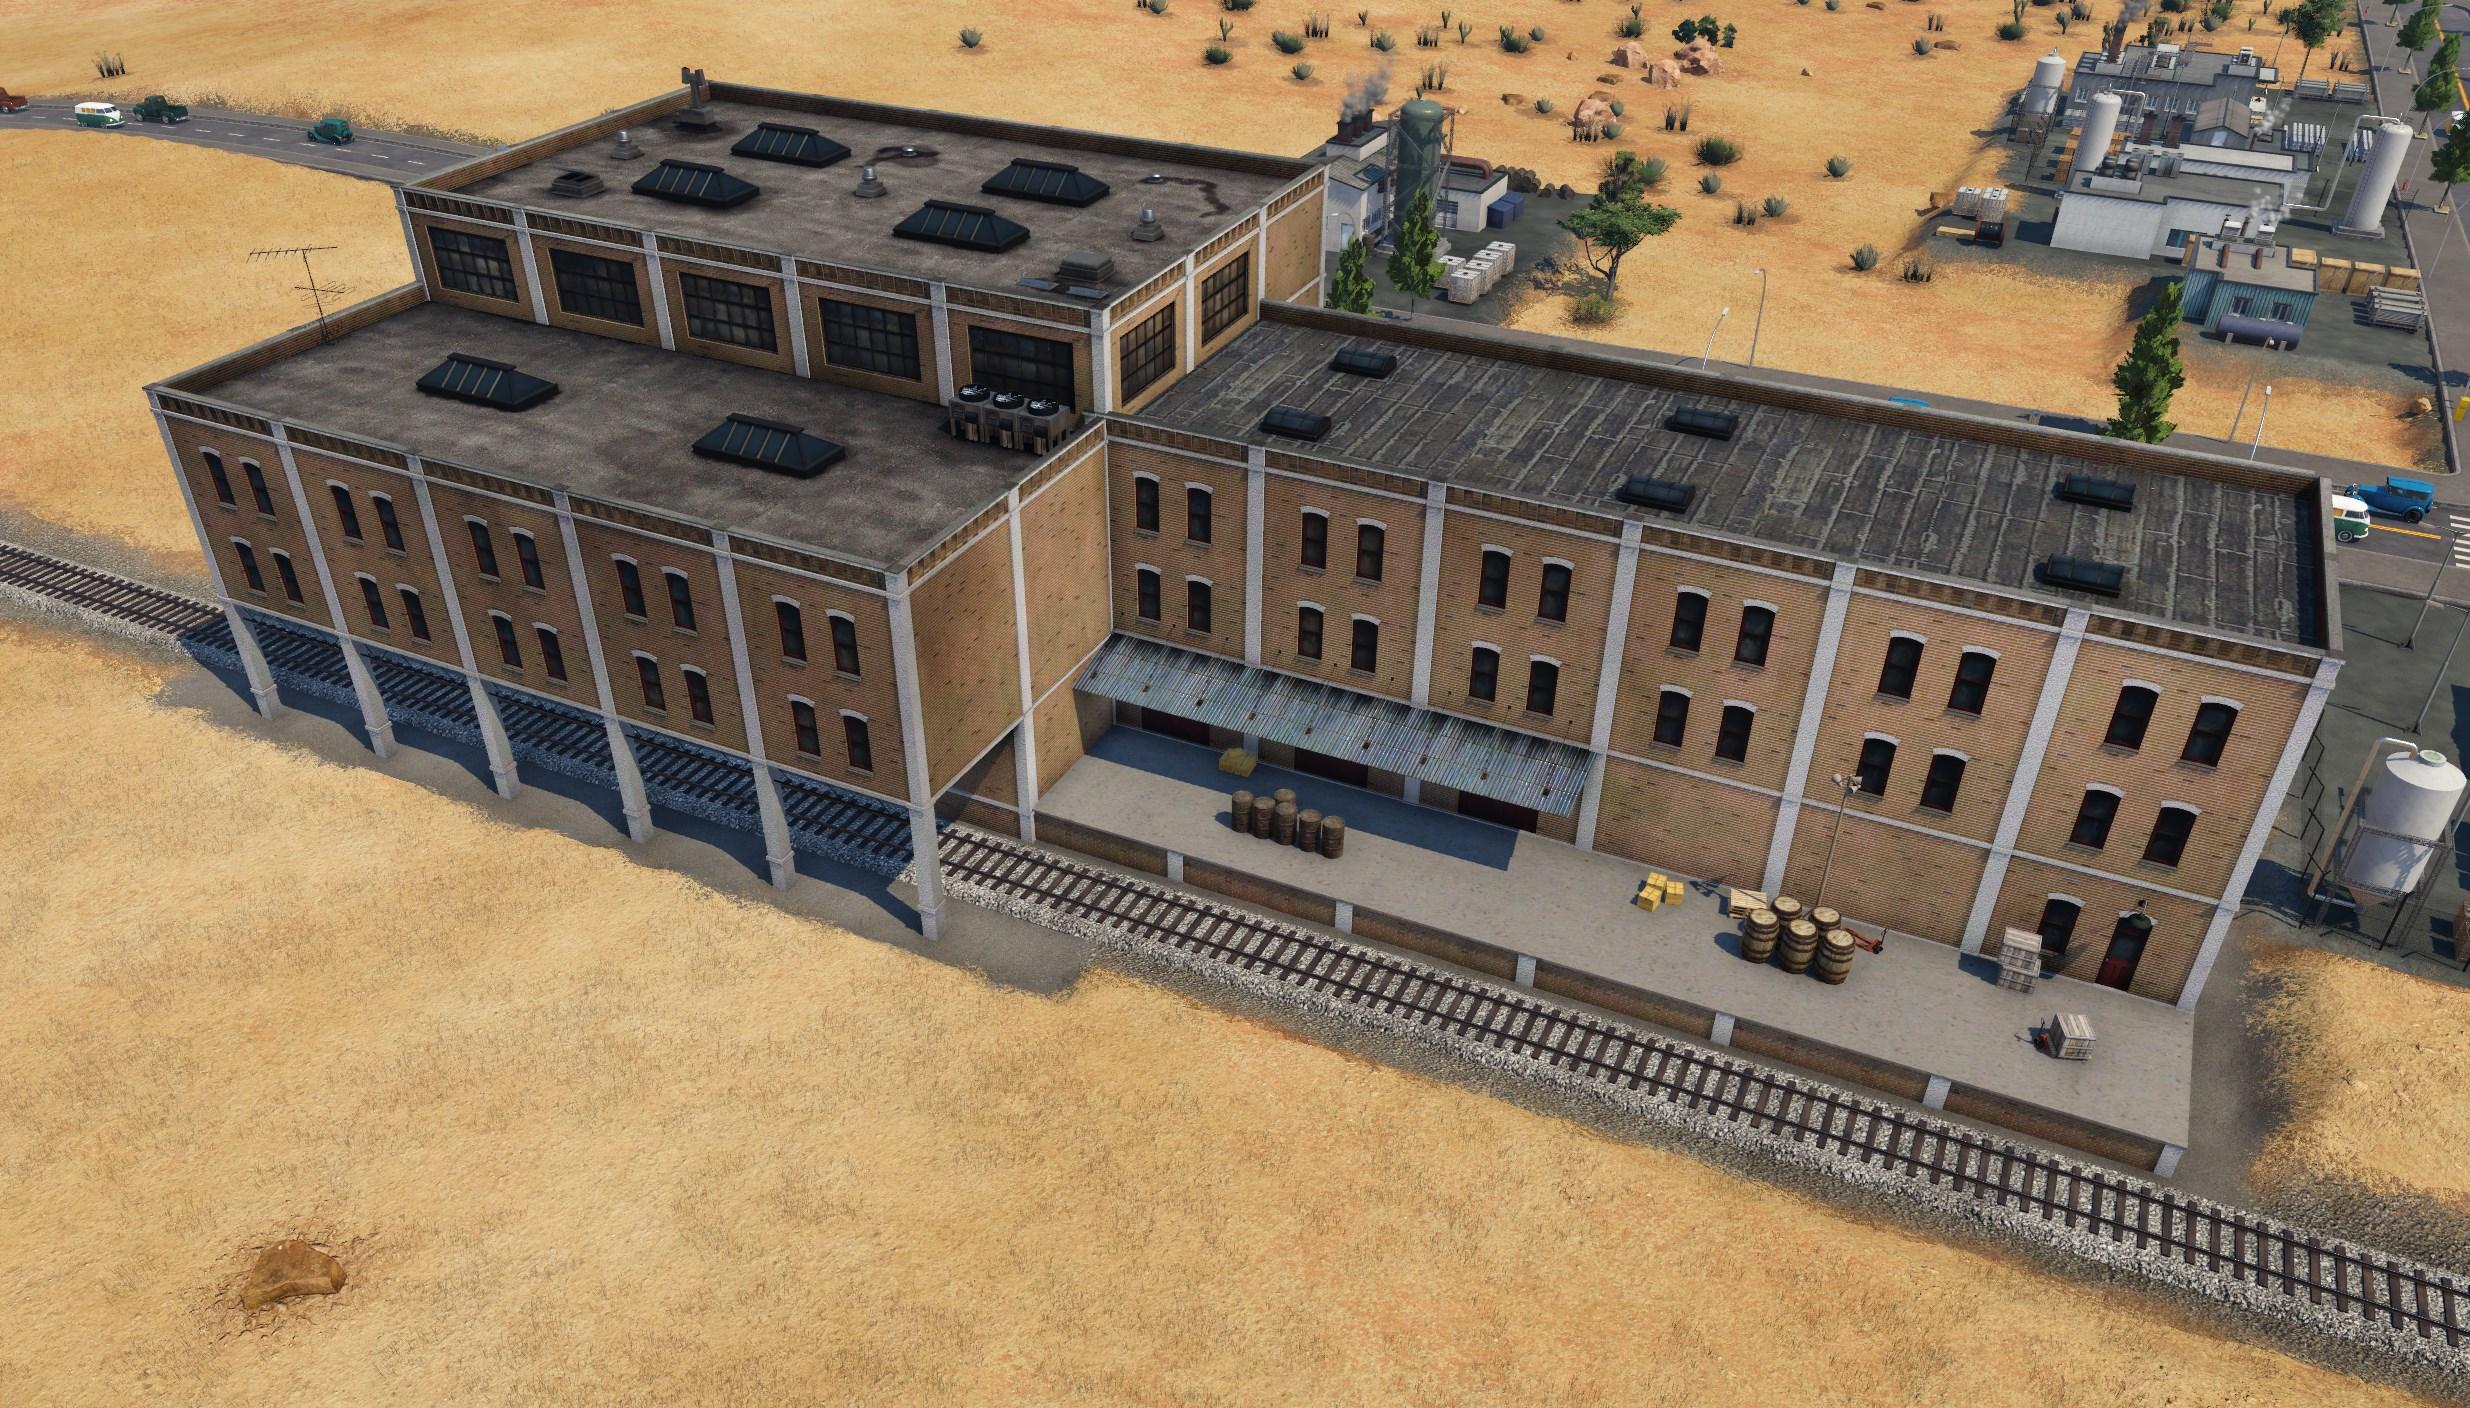 Transport Fever 2 - Trackside Buildings